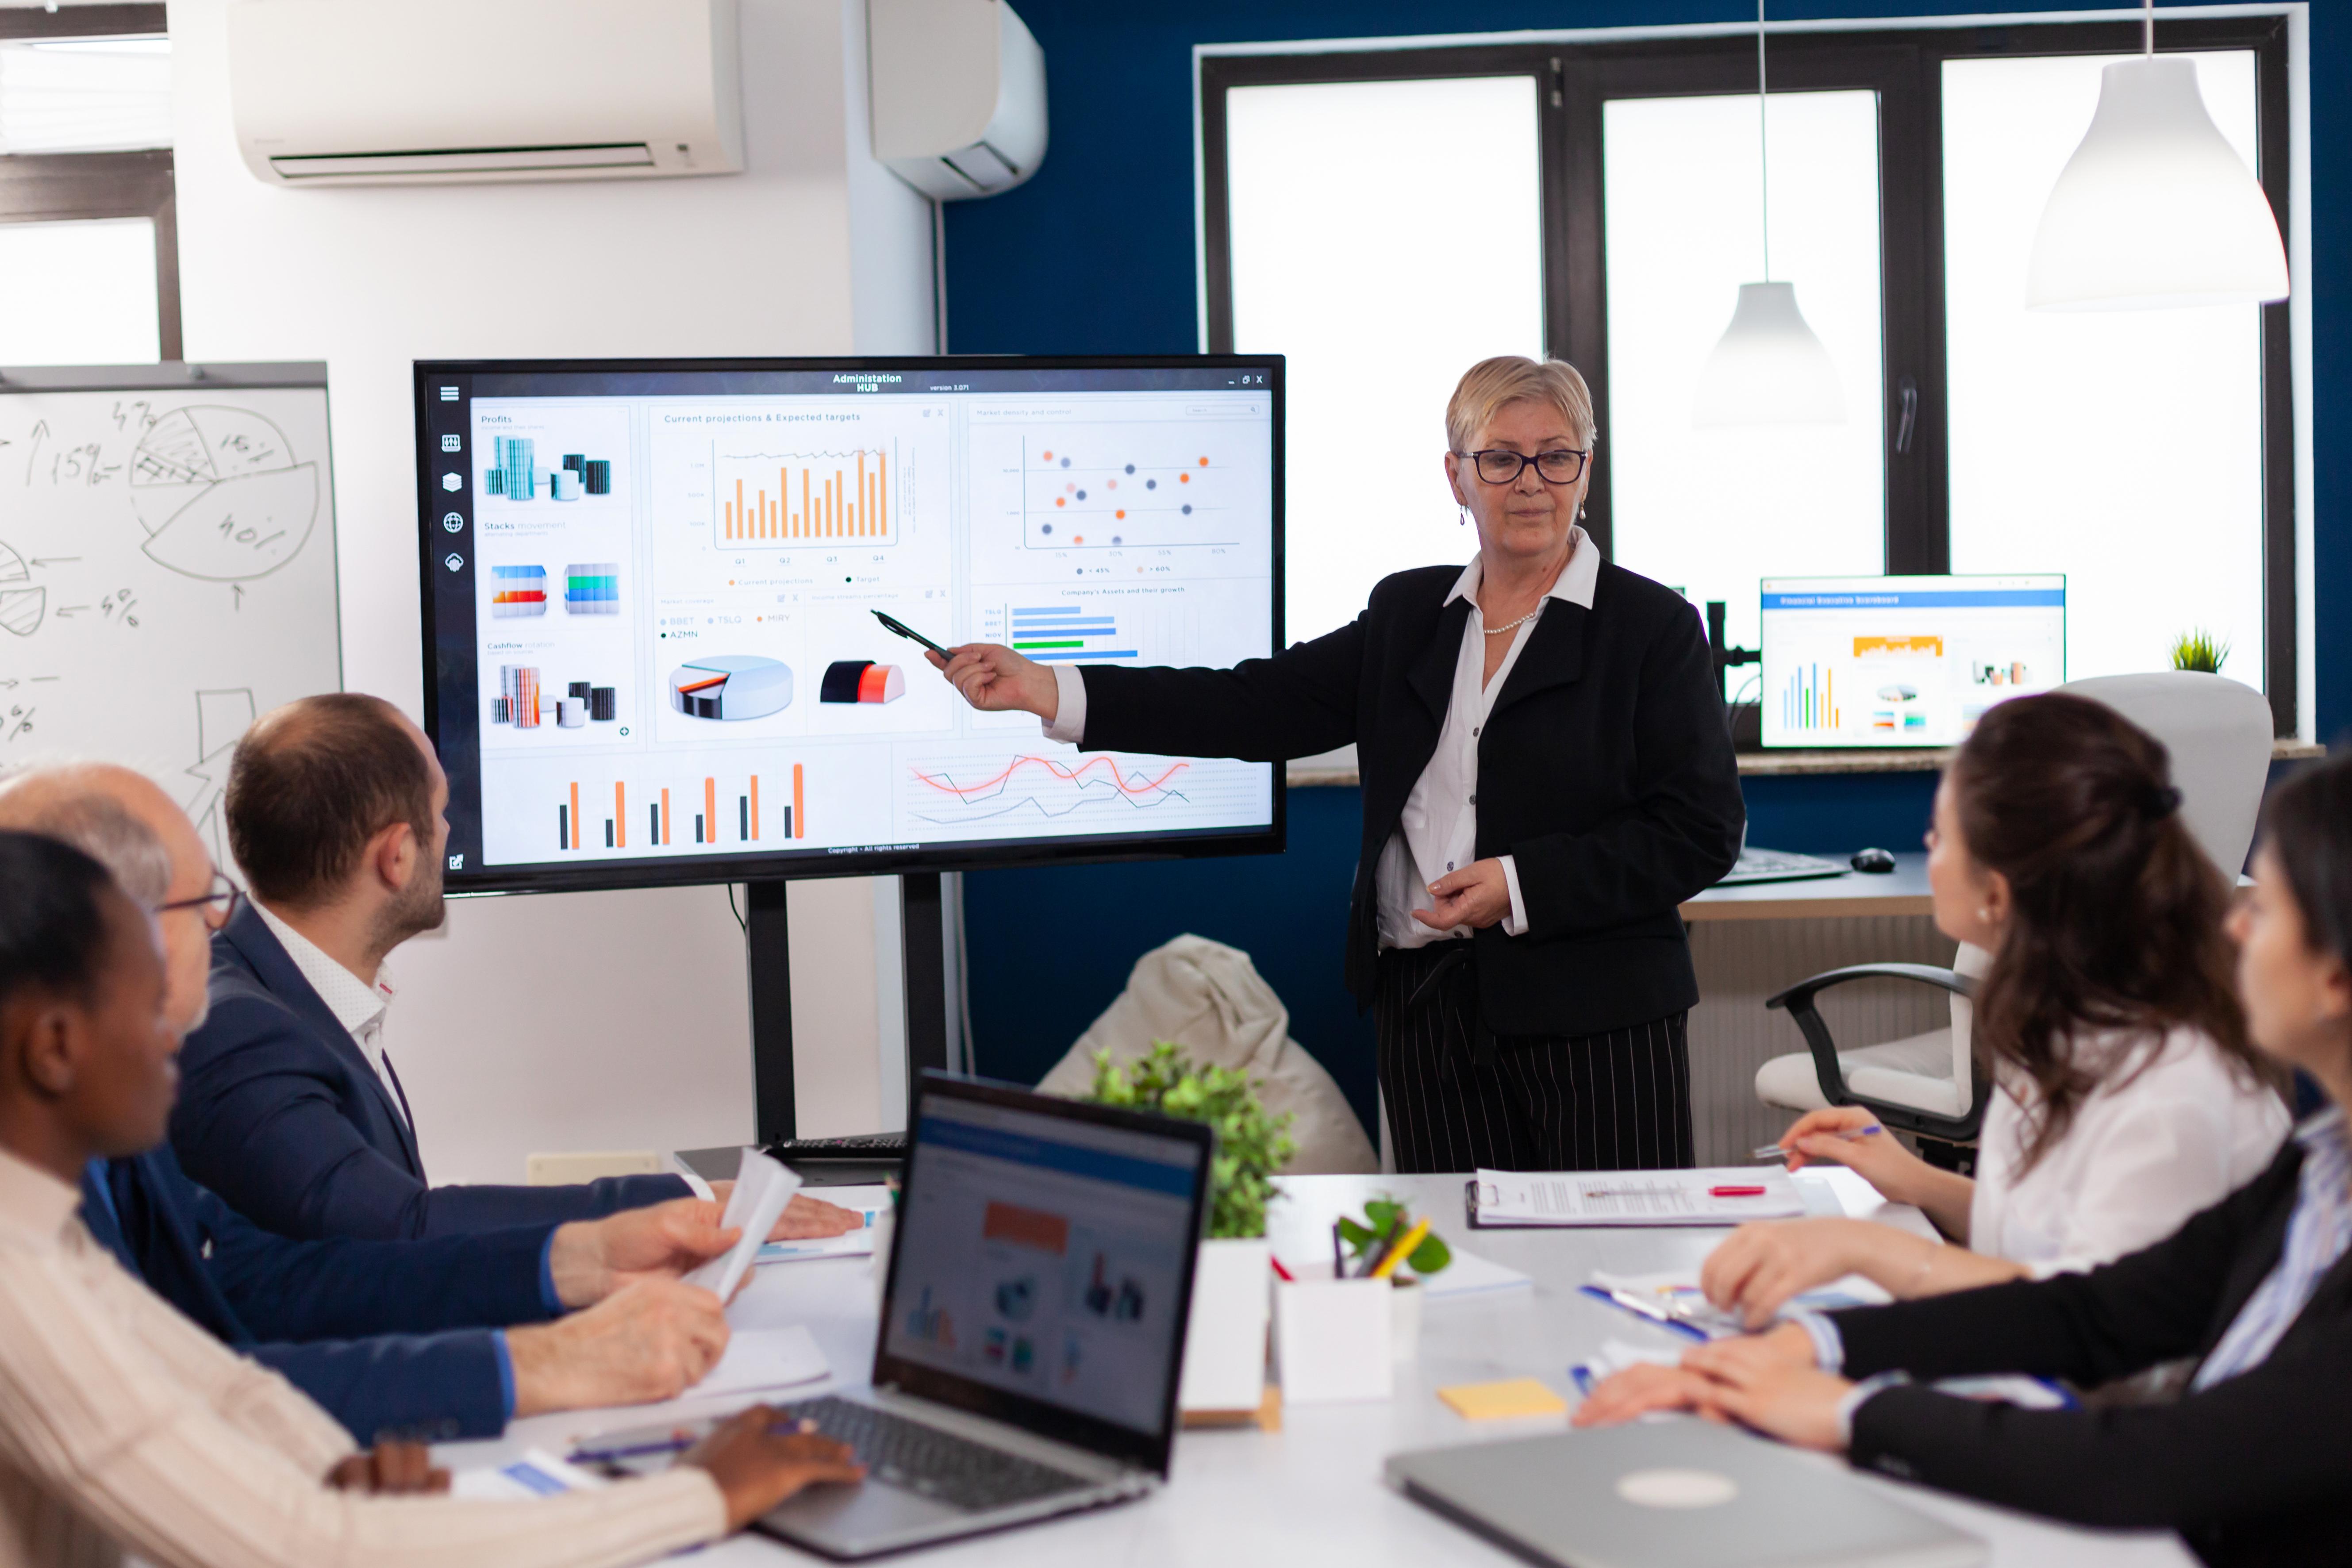 senior-startup-businesswoman-holding-presentatin-conference-room-briefing-graph-information.jpg